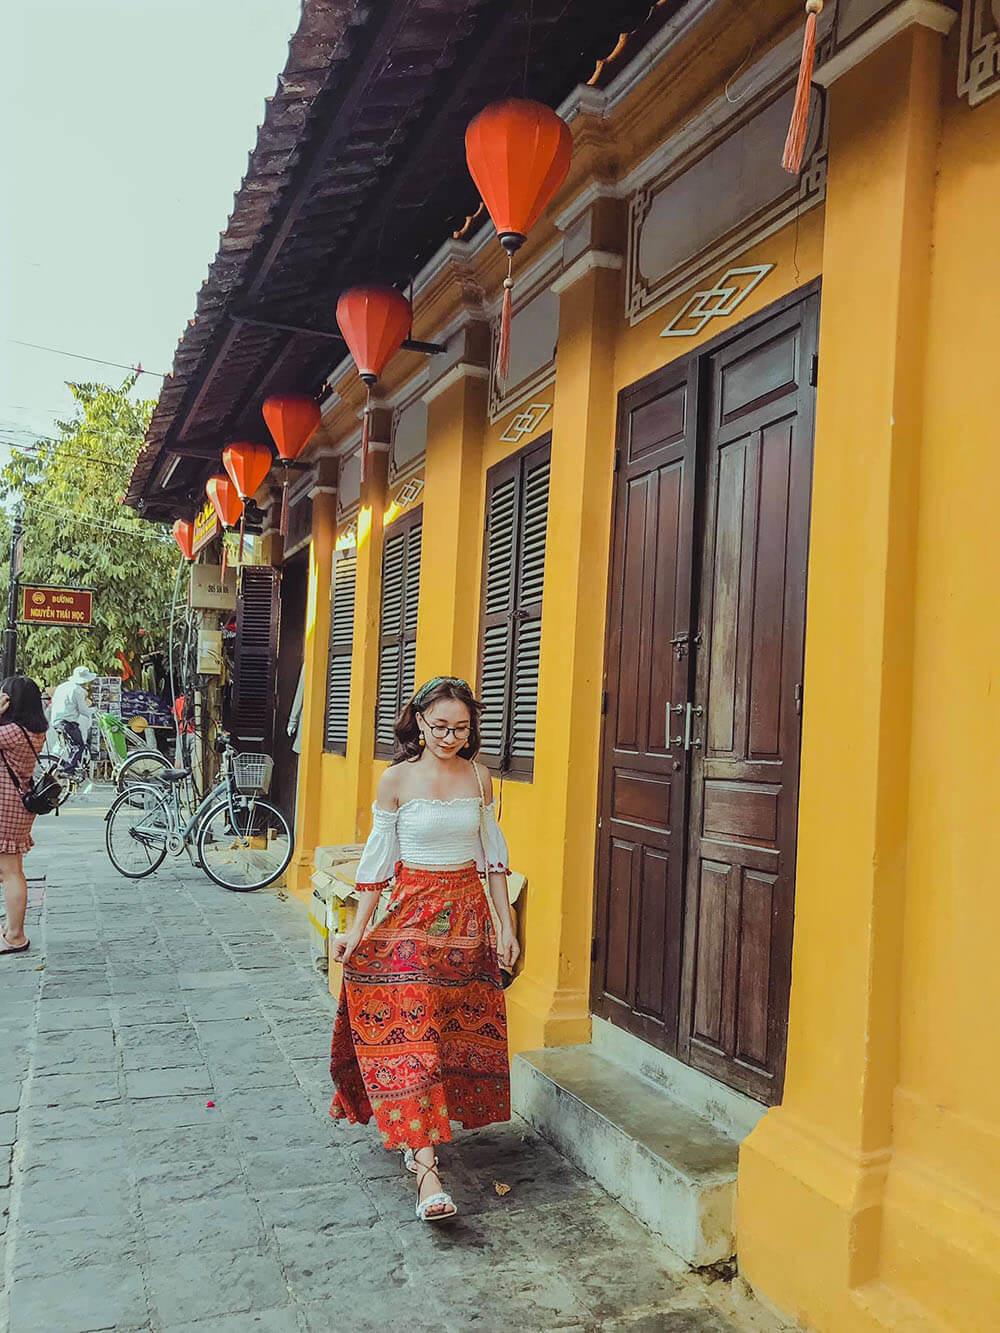 Pho Co Hoi An Review Chuyen Du Lich Hoi An Da Nang Cua 02 Co Ban Than